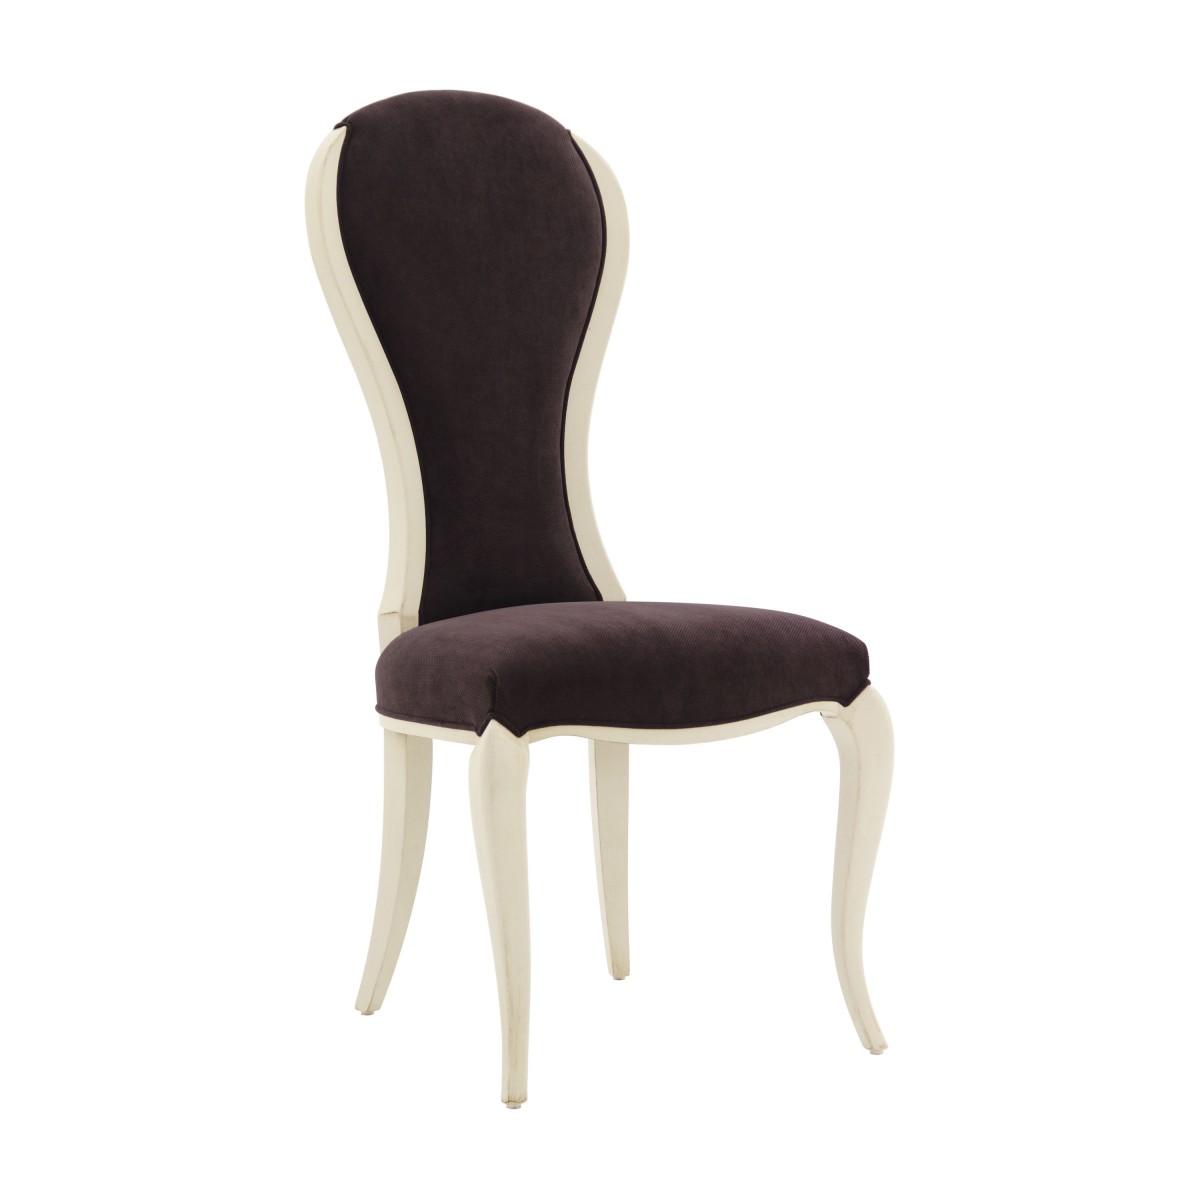 italian modern chair alina 0 3894